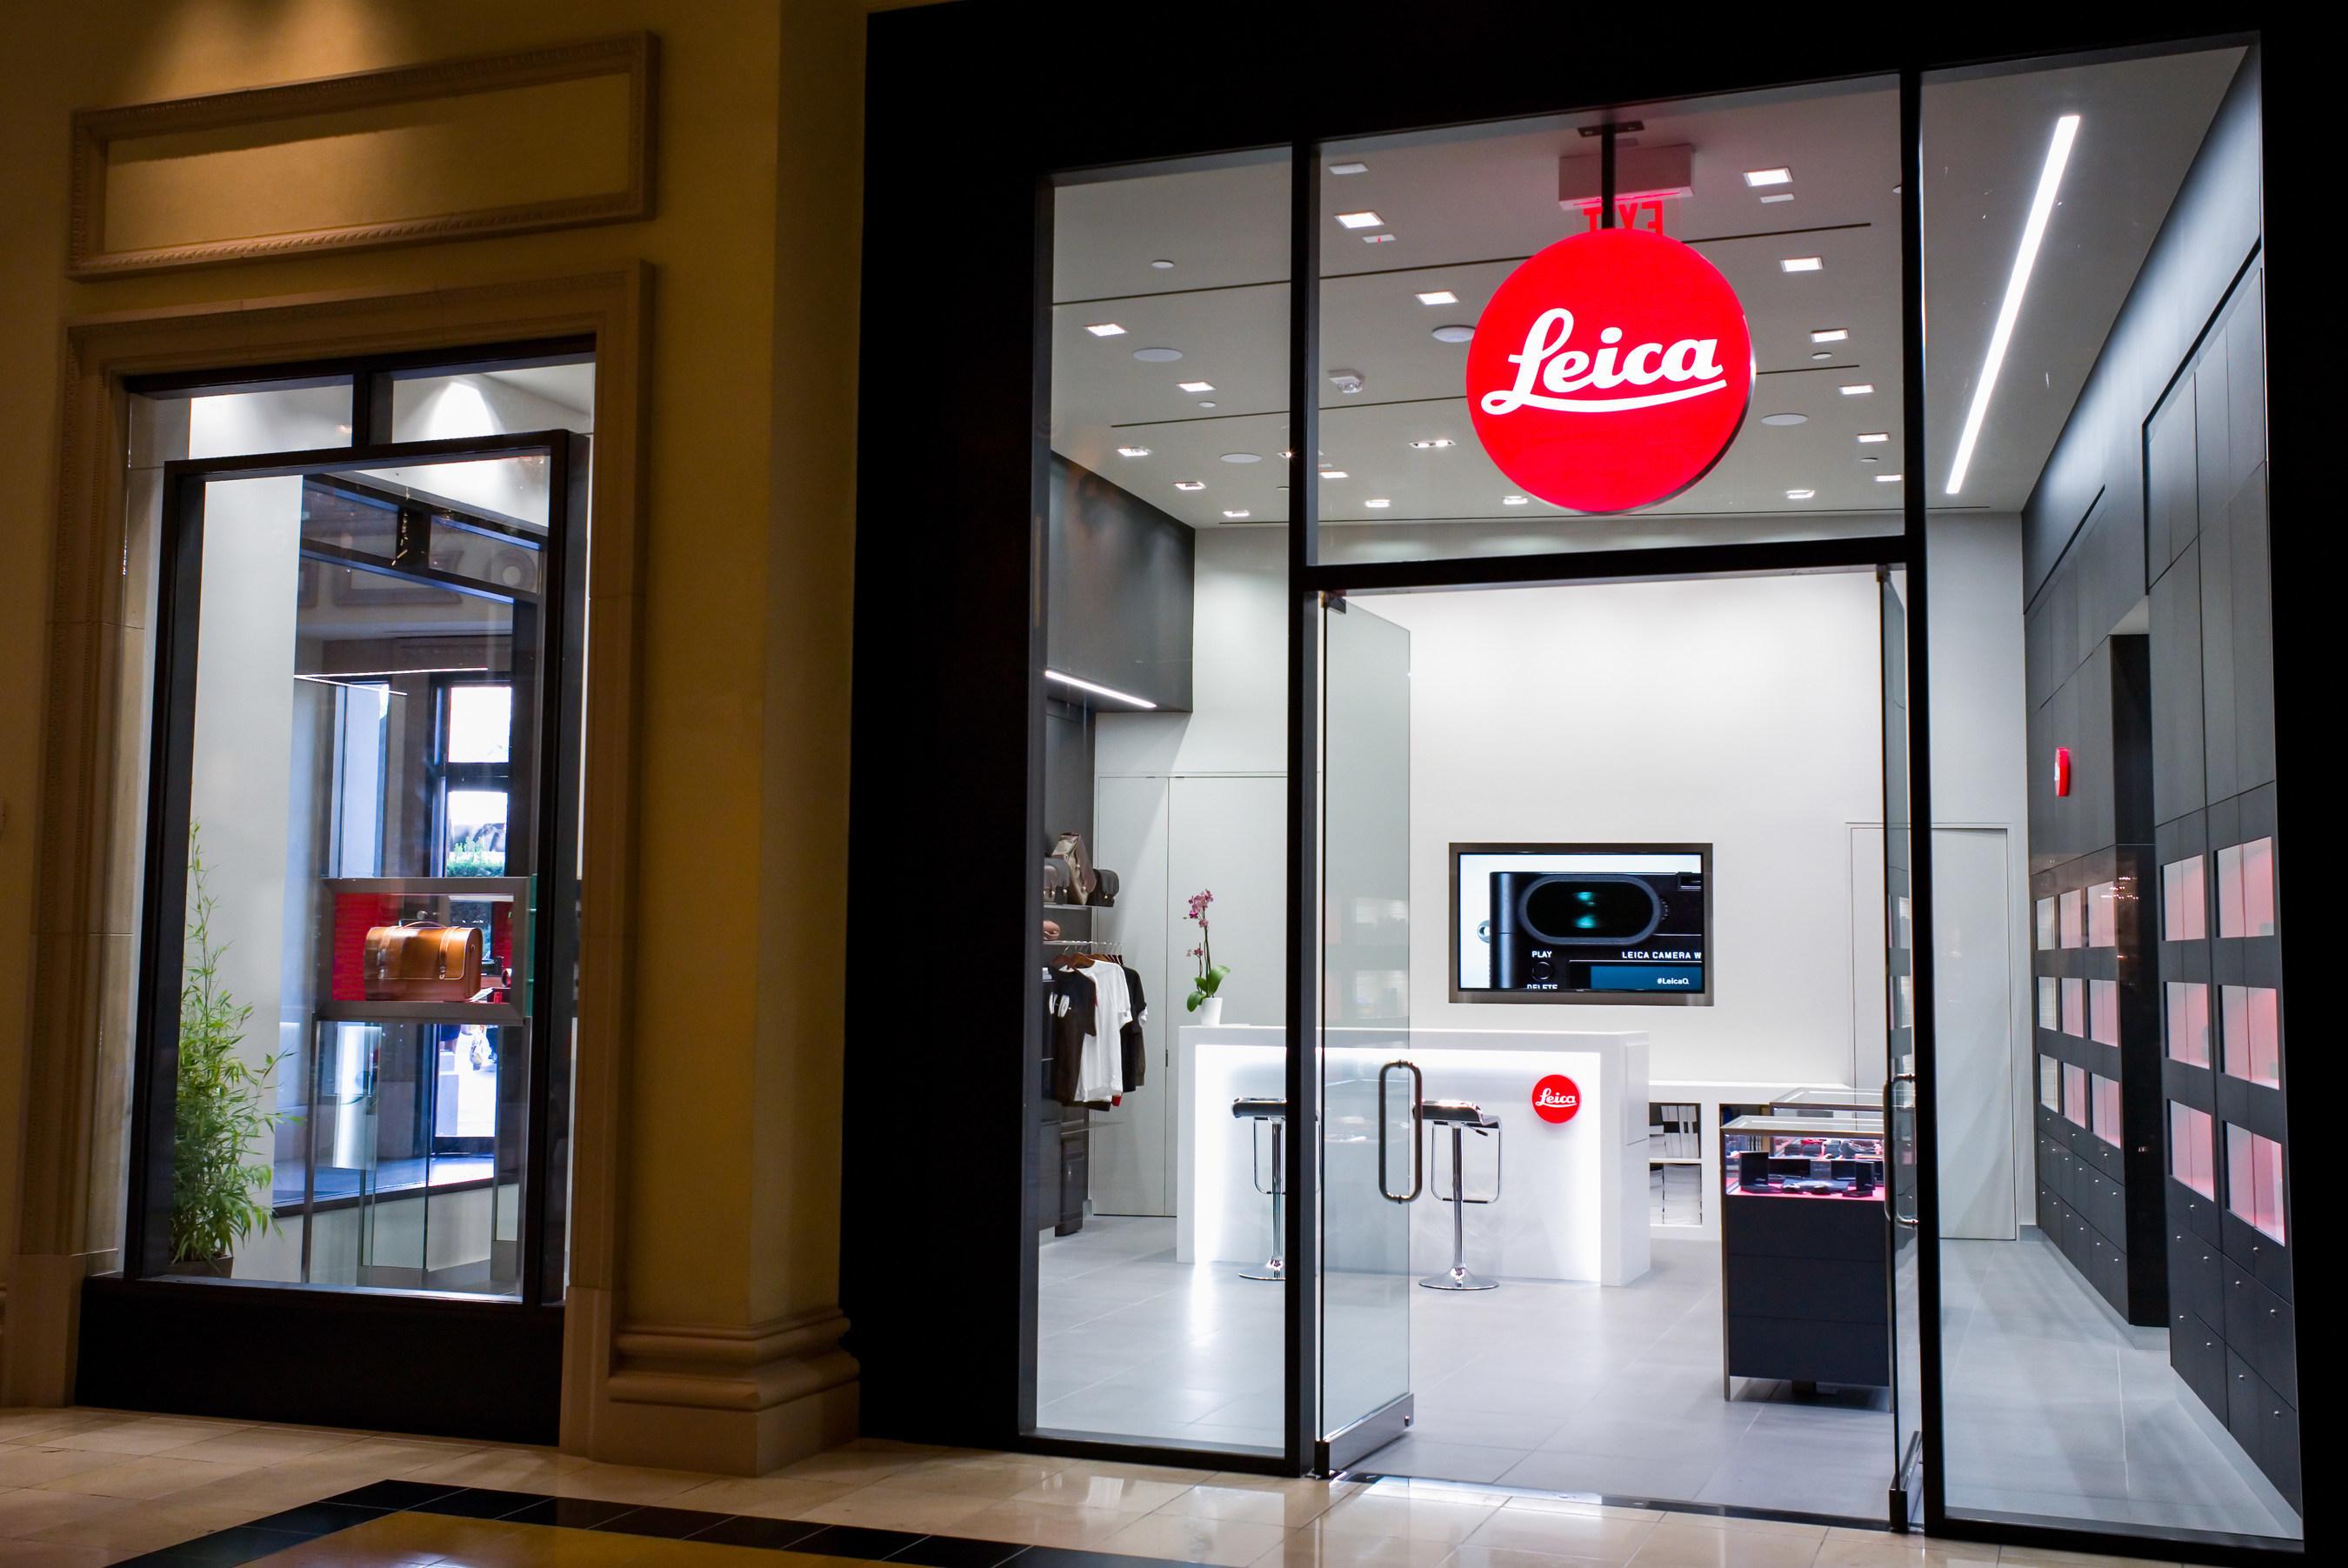 Leica Opens First Las Vegas Store: Brings Premium Camera